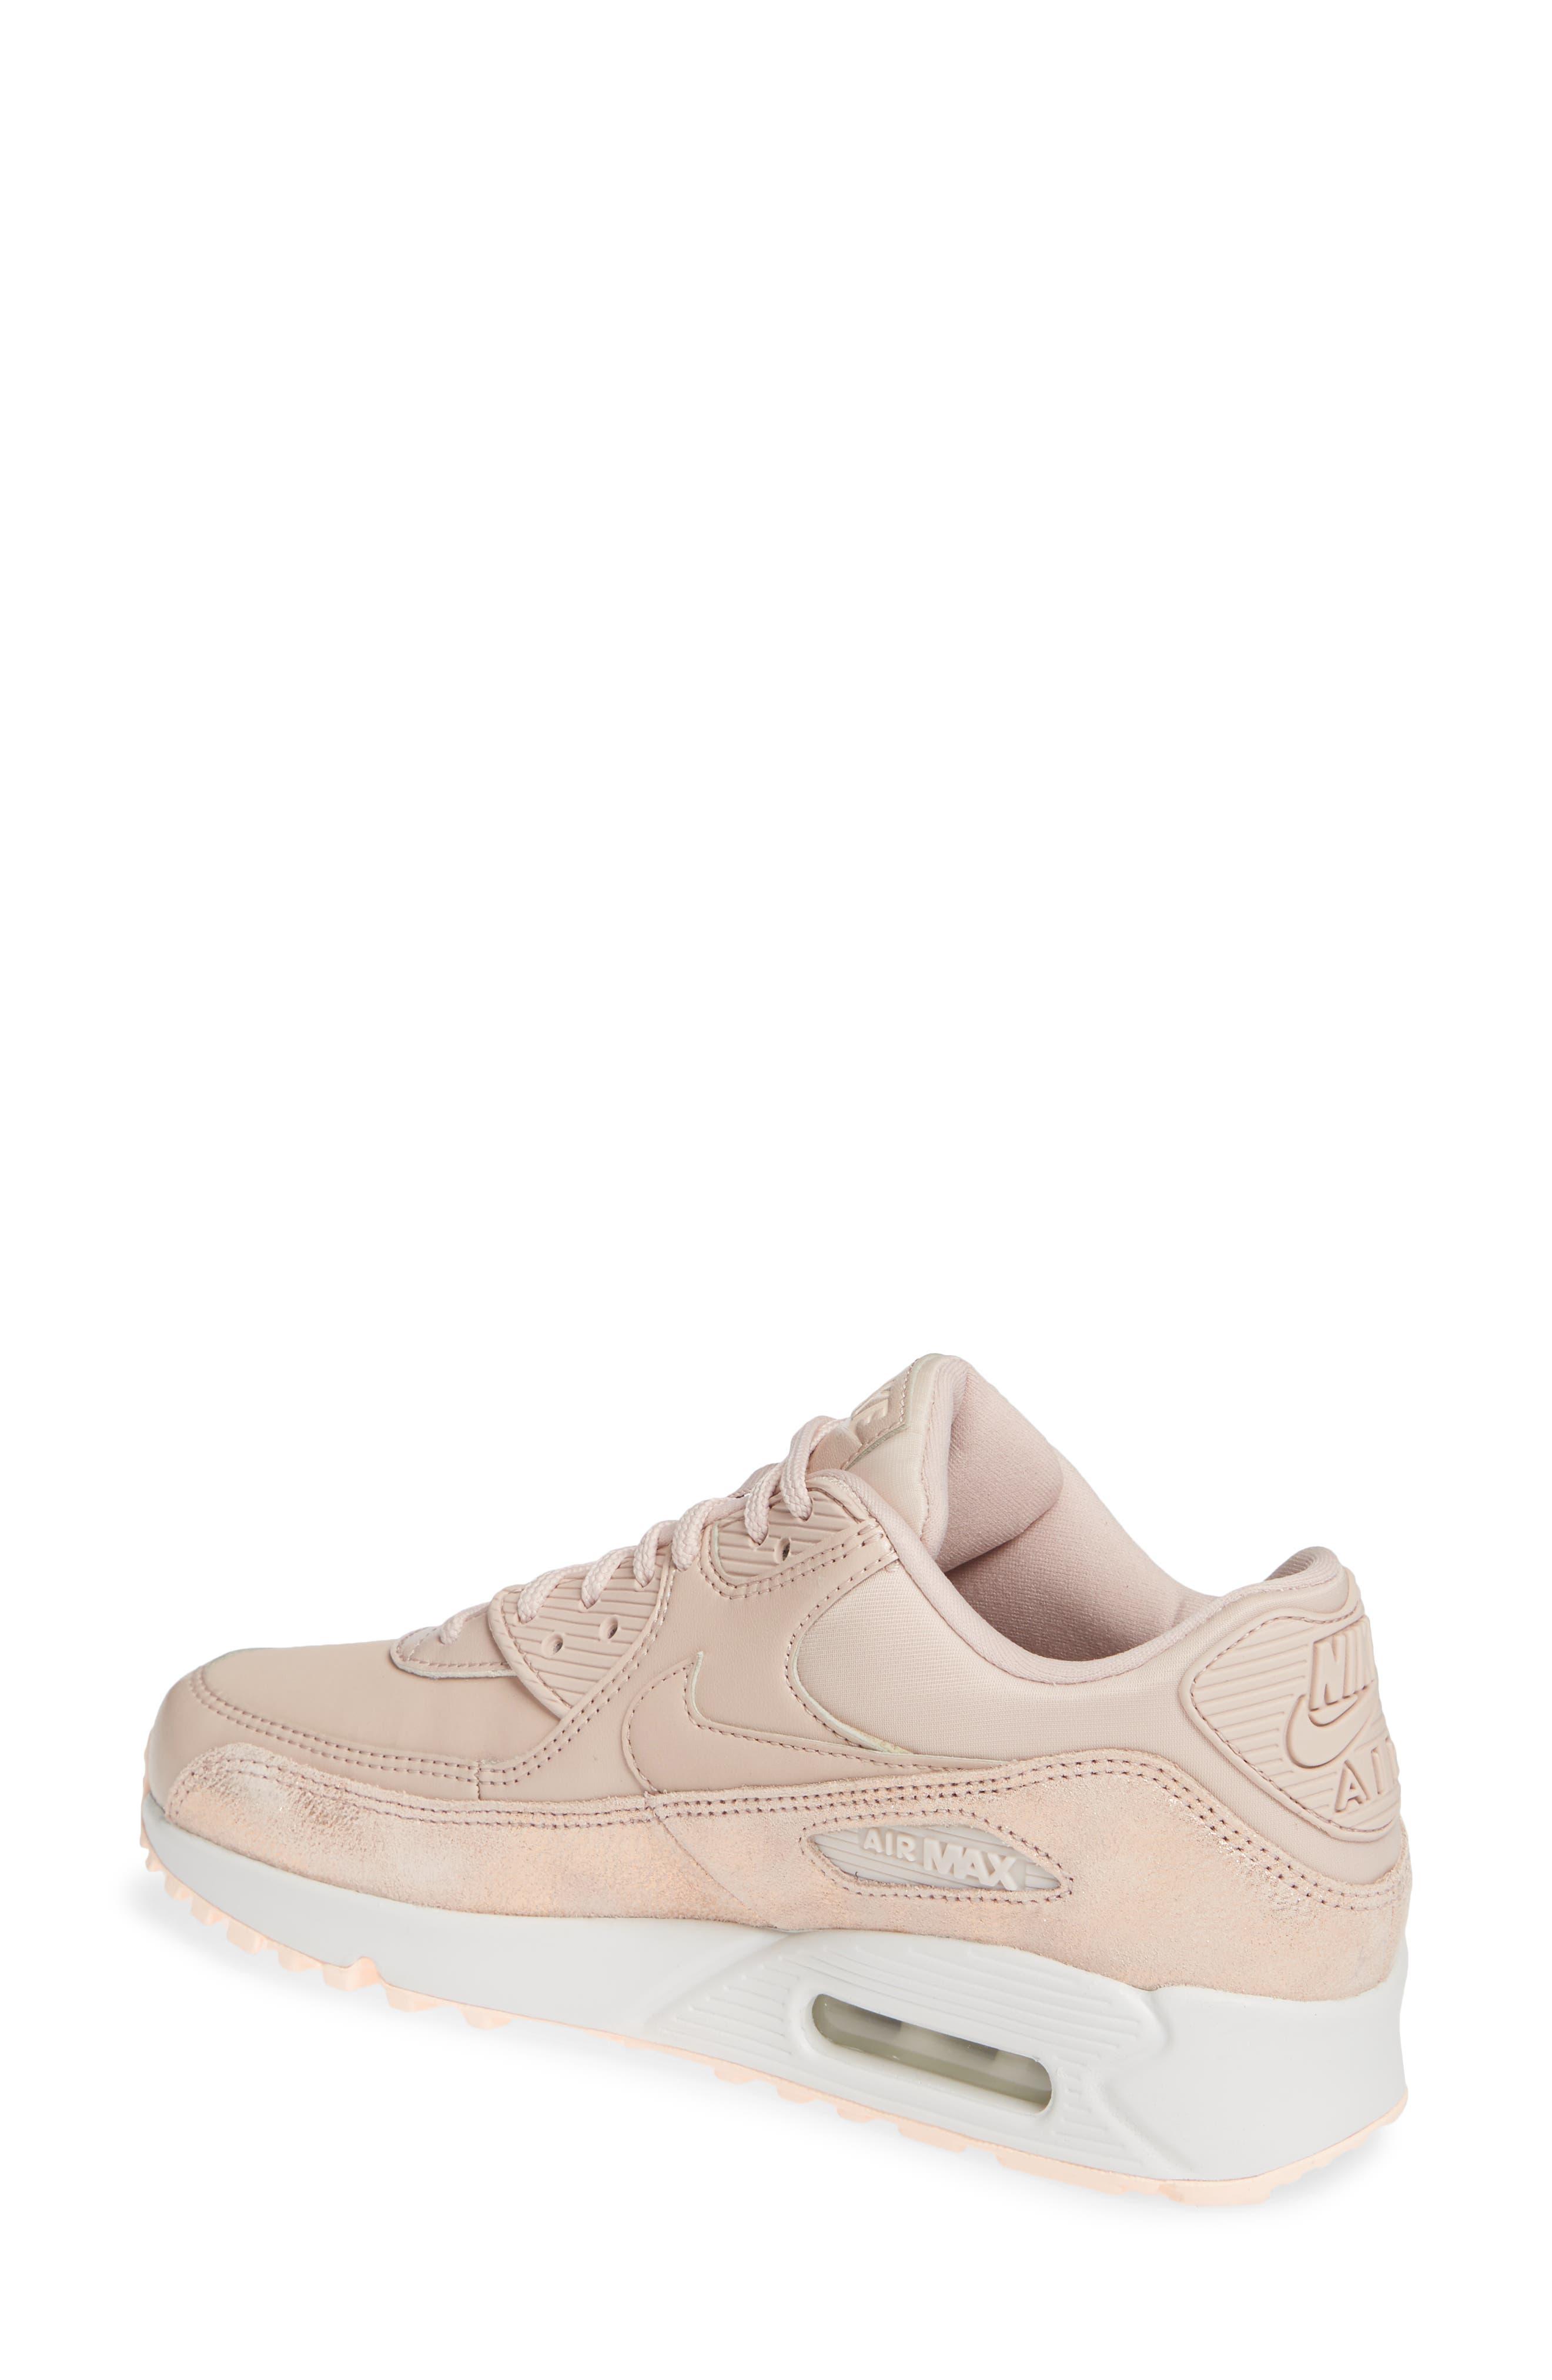 Air Max 90 SE Sneaker,                             Alternate thumbnail 11, color,